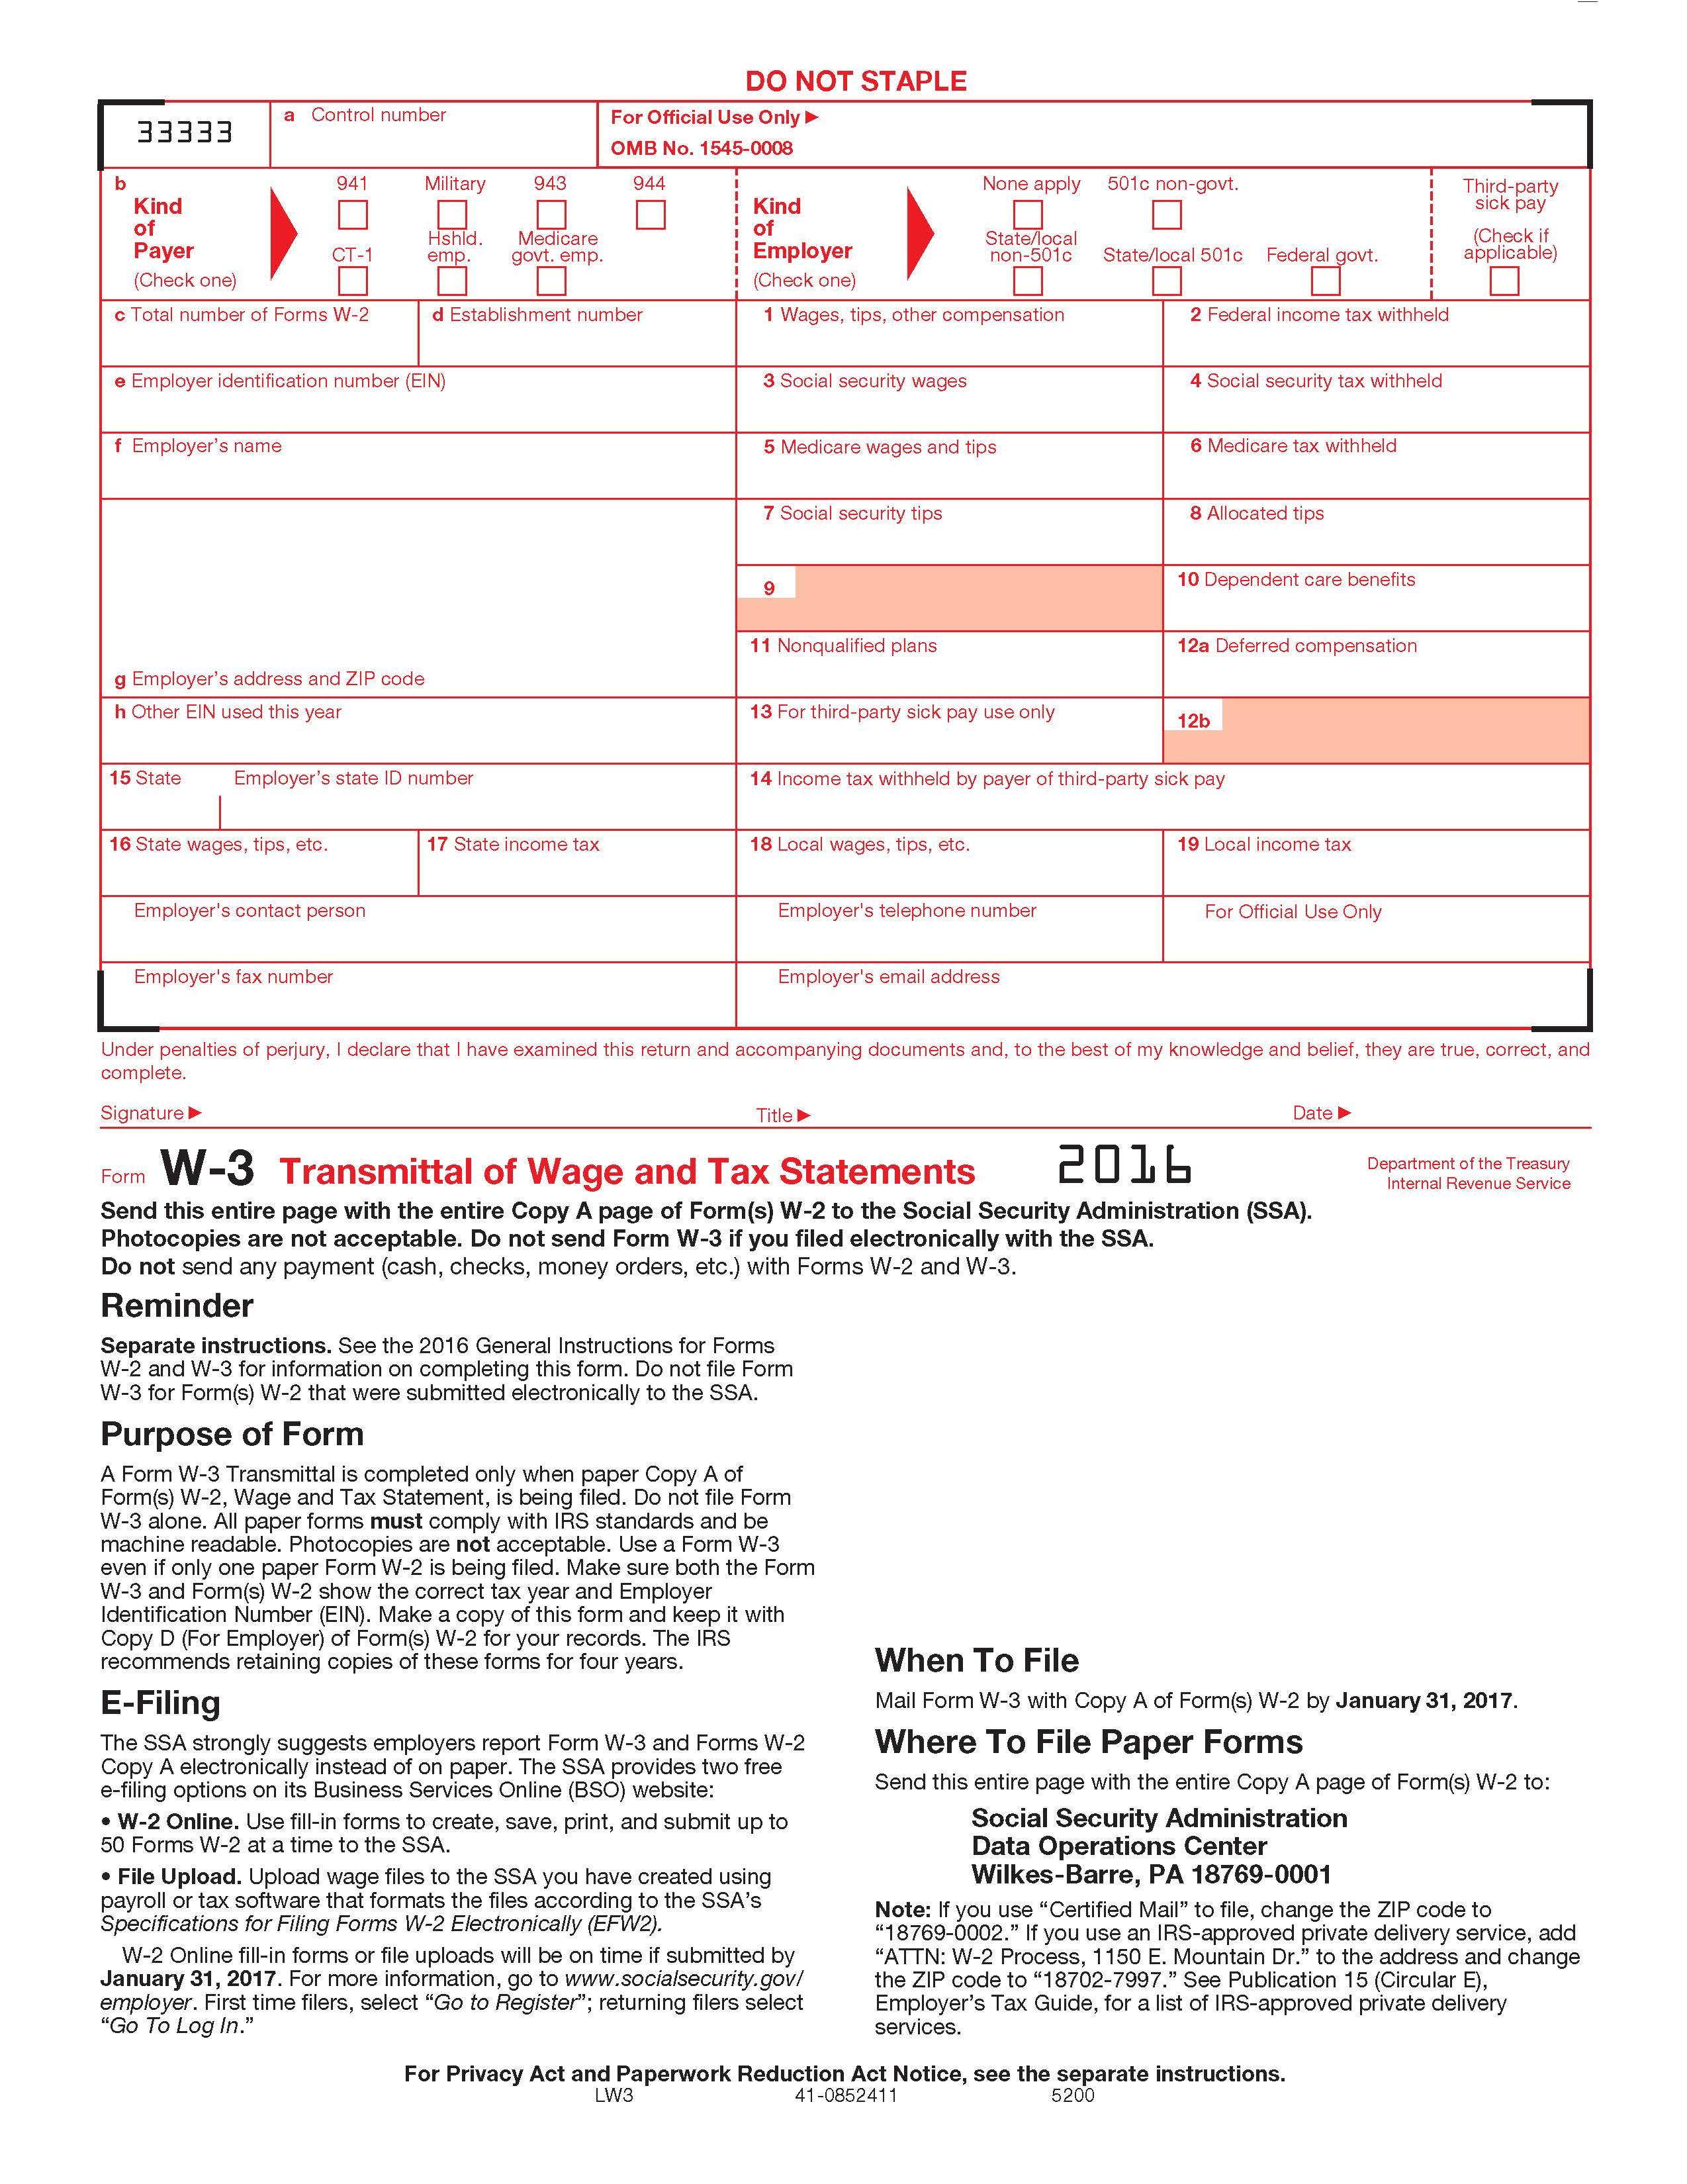 W3 Transmittal Form for W2 Forms